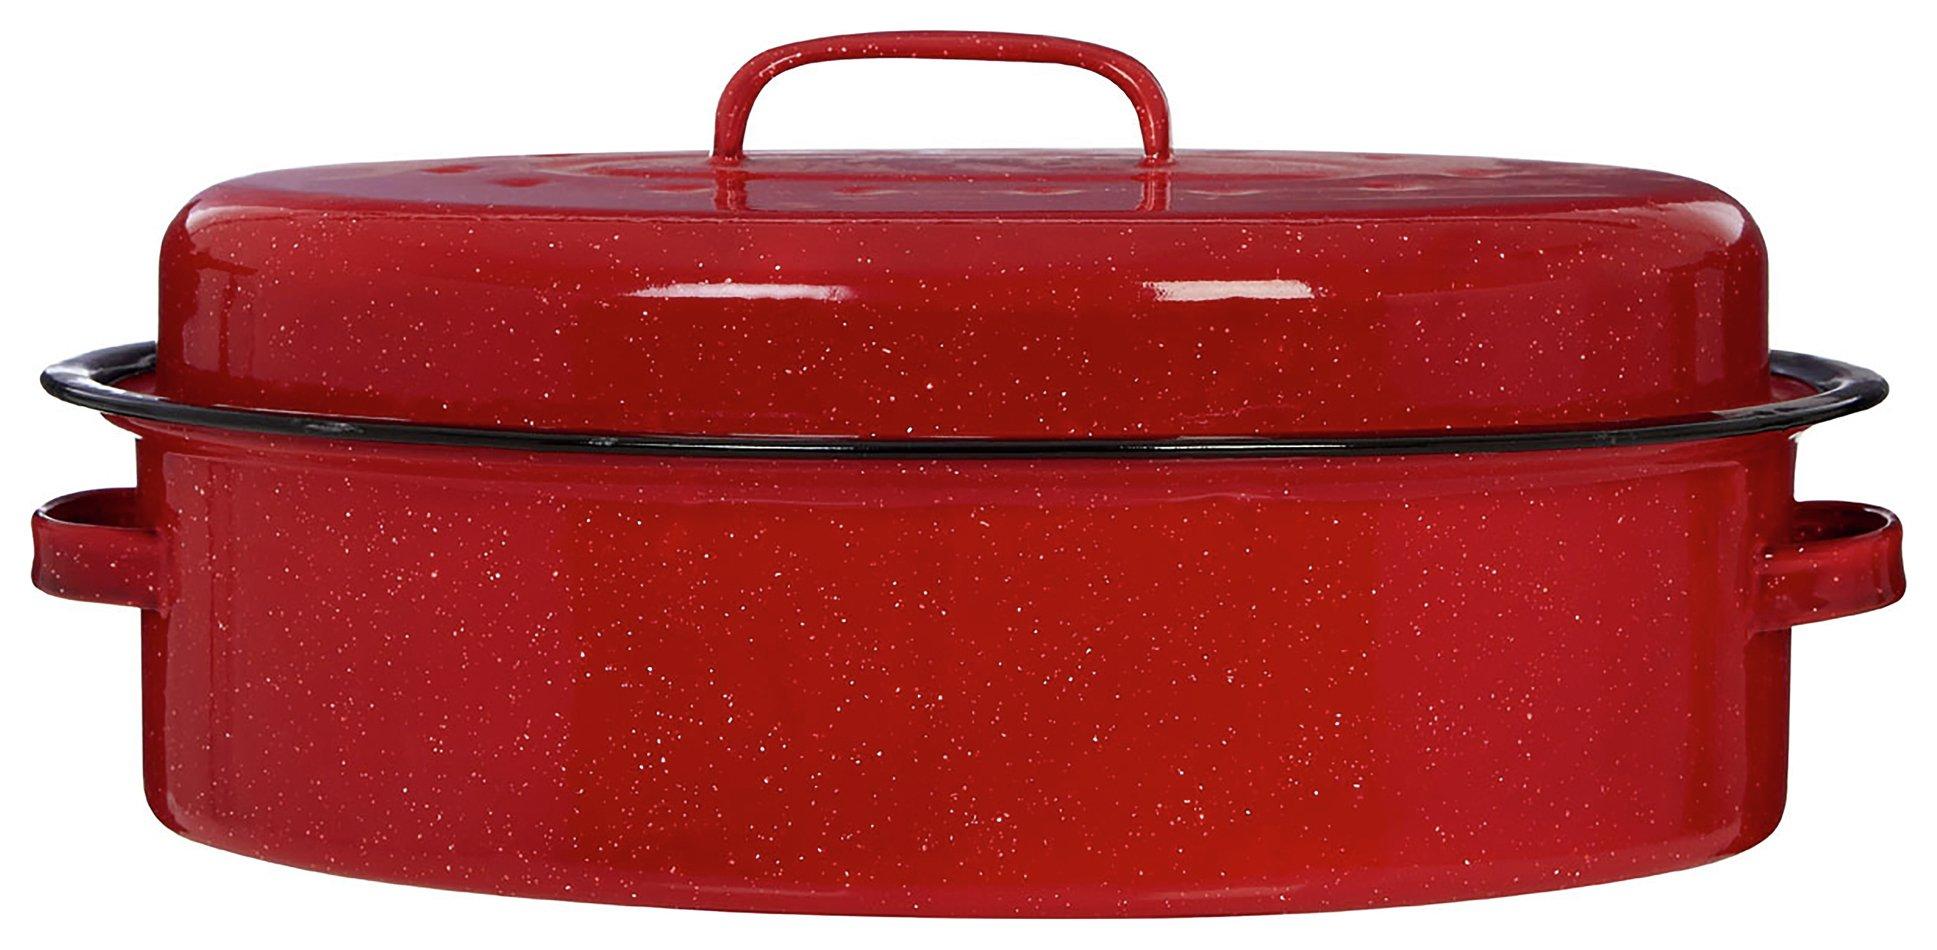 Premier Housewares Enamel Oval Roaster with Lid - Red